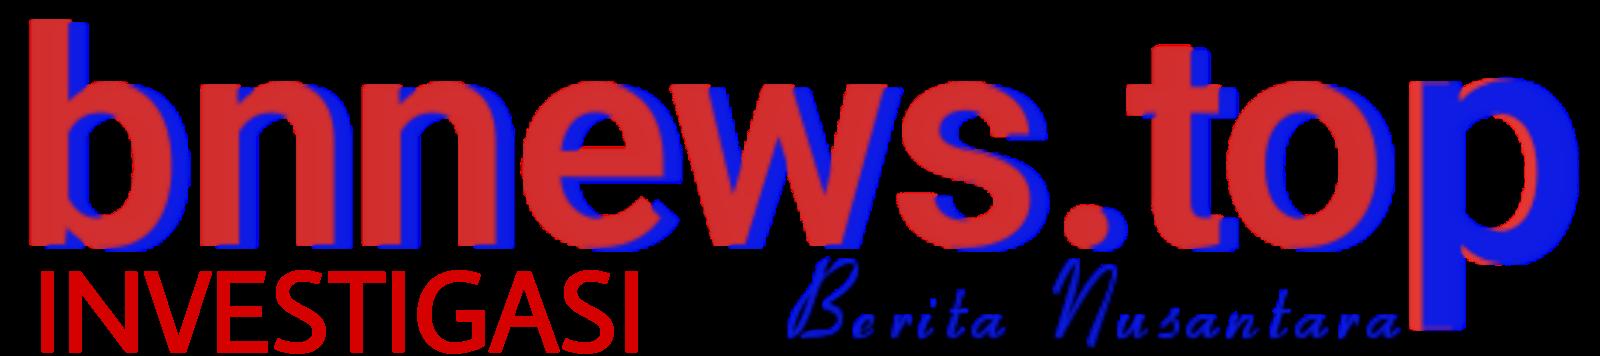 BNNEWS INVESTIGASI Copyright 2021